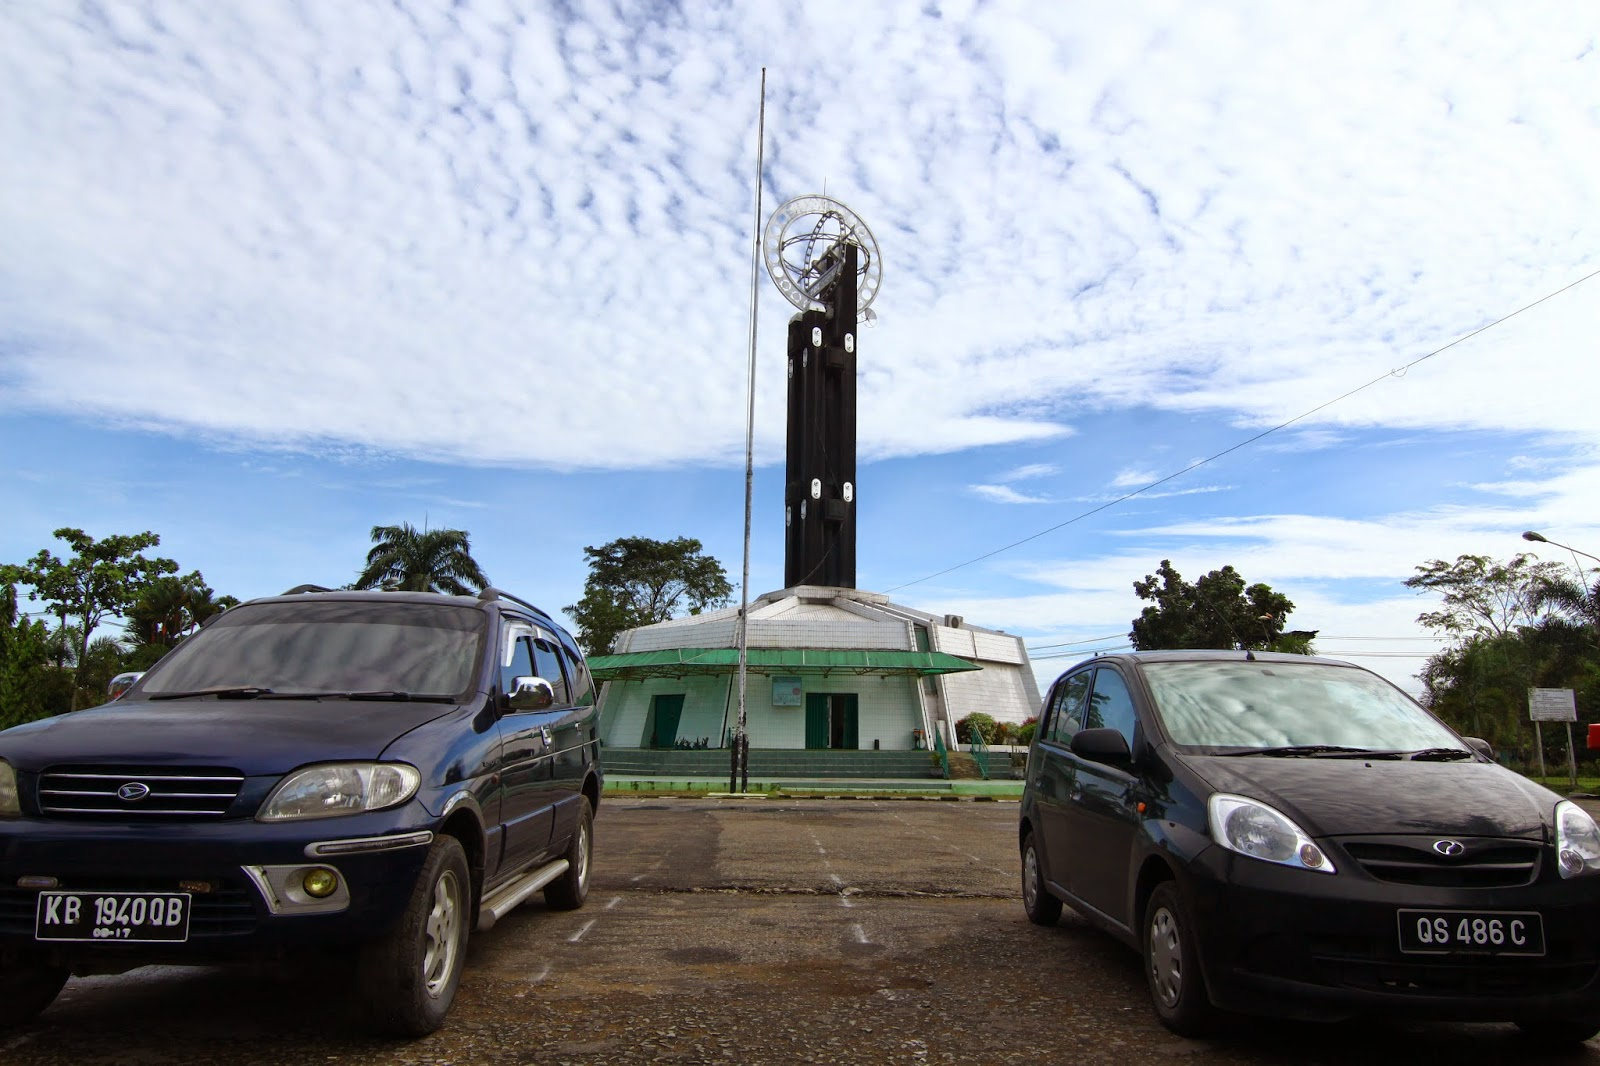 Parkir di depan Tugu Khatulistiwa, Pontianak